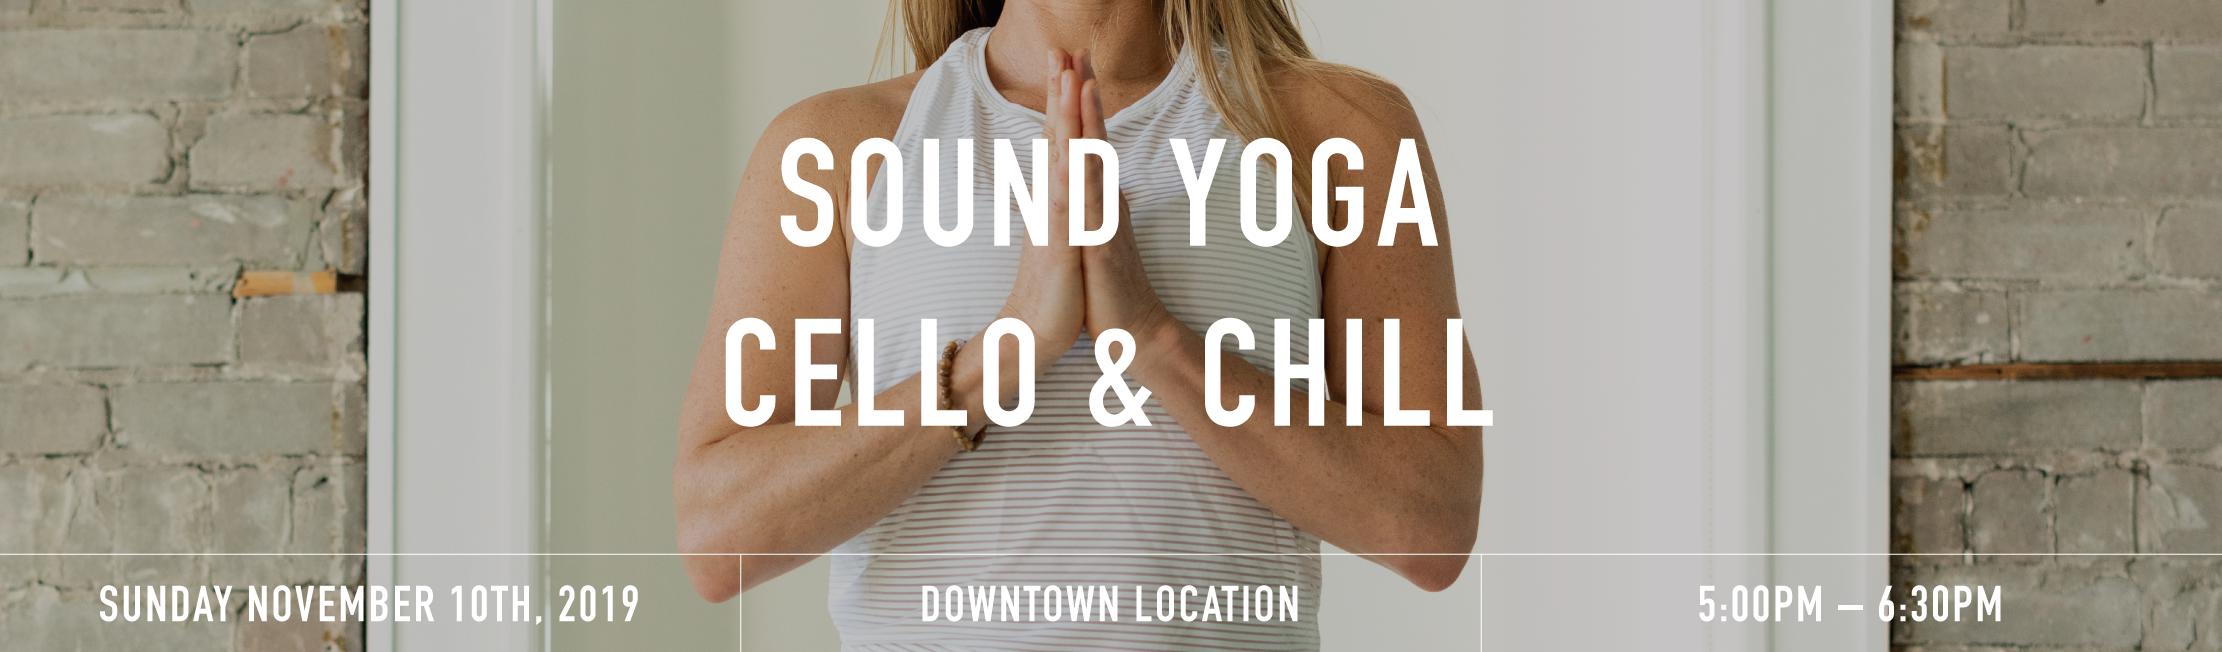 Sound yoga banner  1